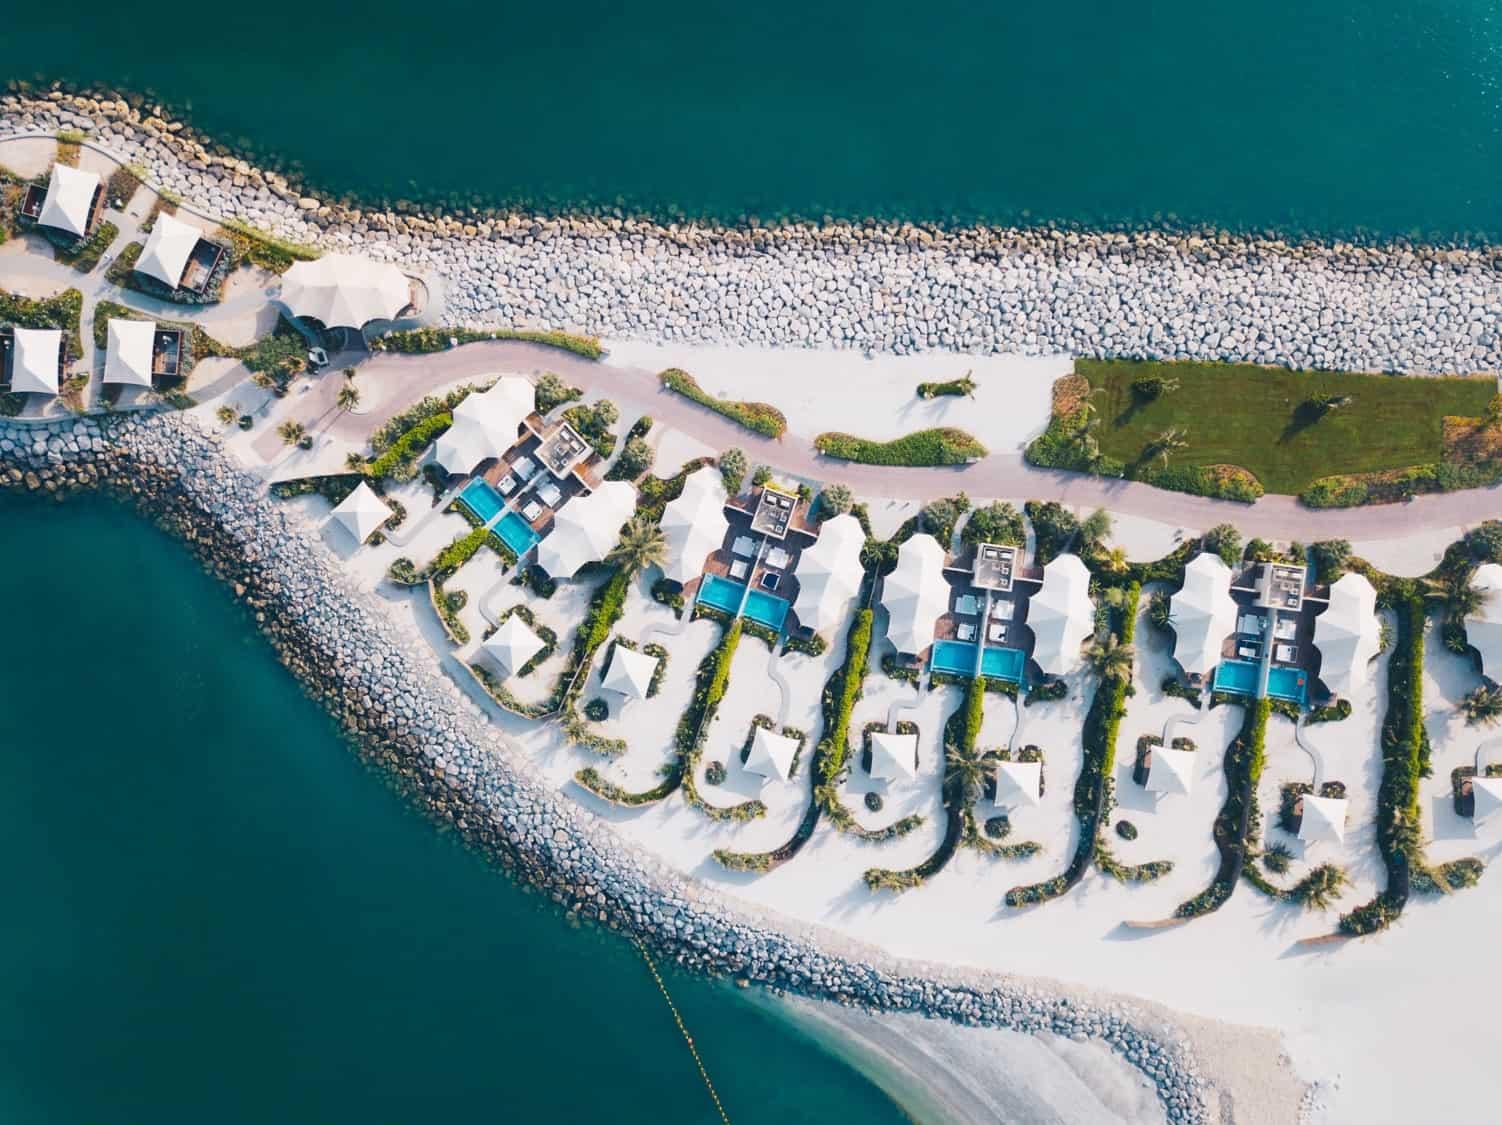 Island-inspired retreat at The Ritz-Carlton Ras Al Khaimah, Al Hamra Beach